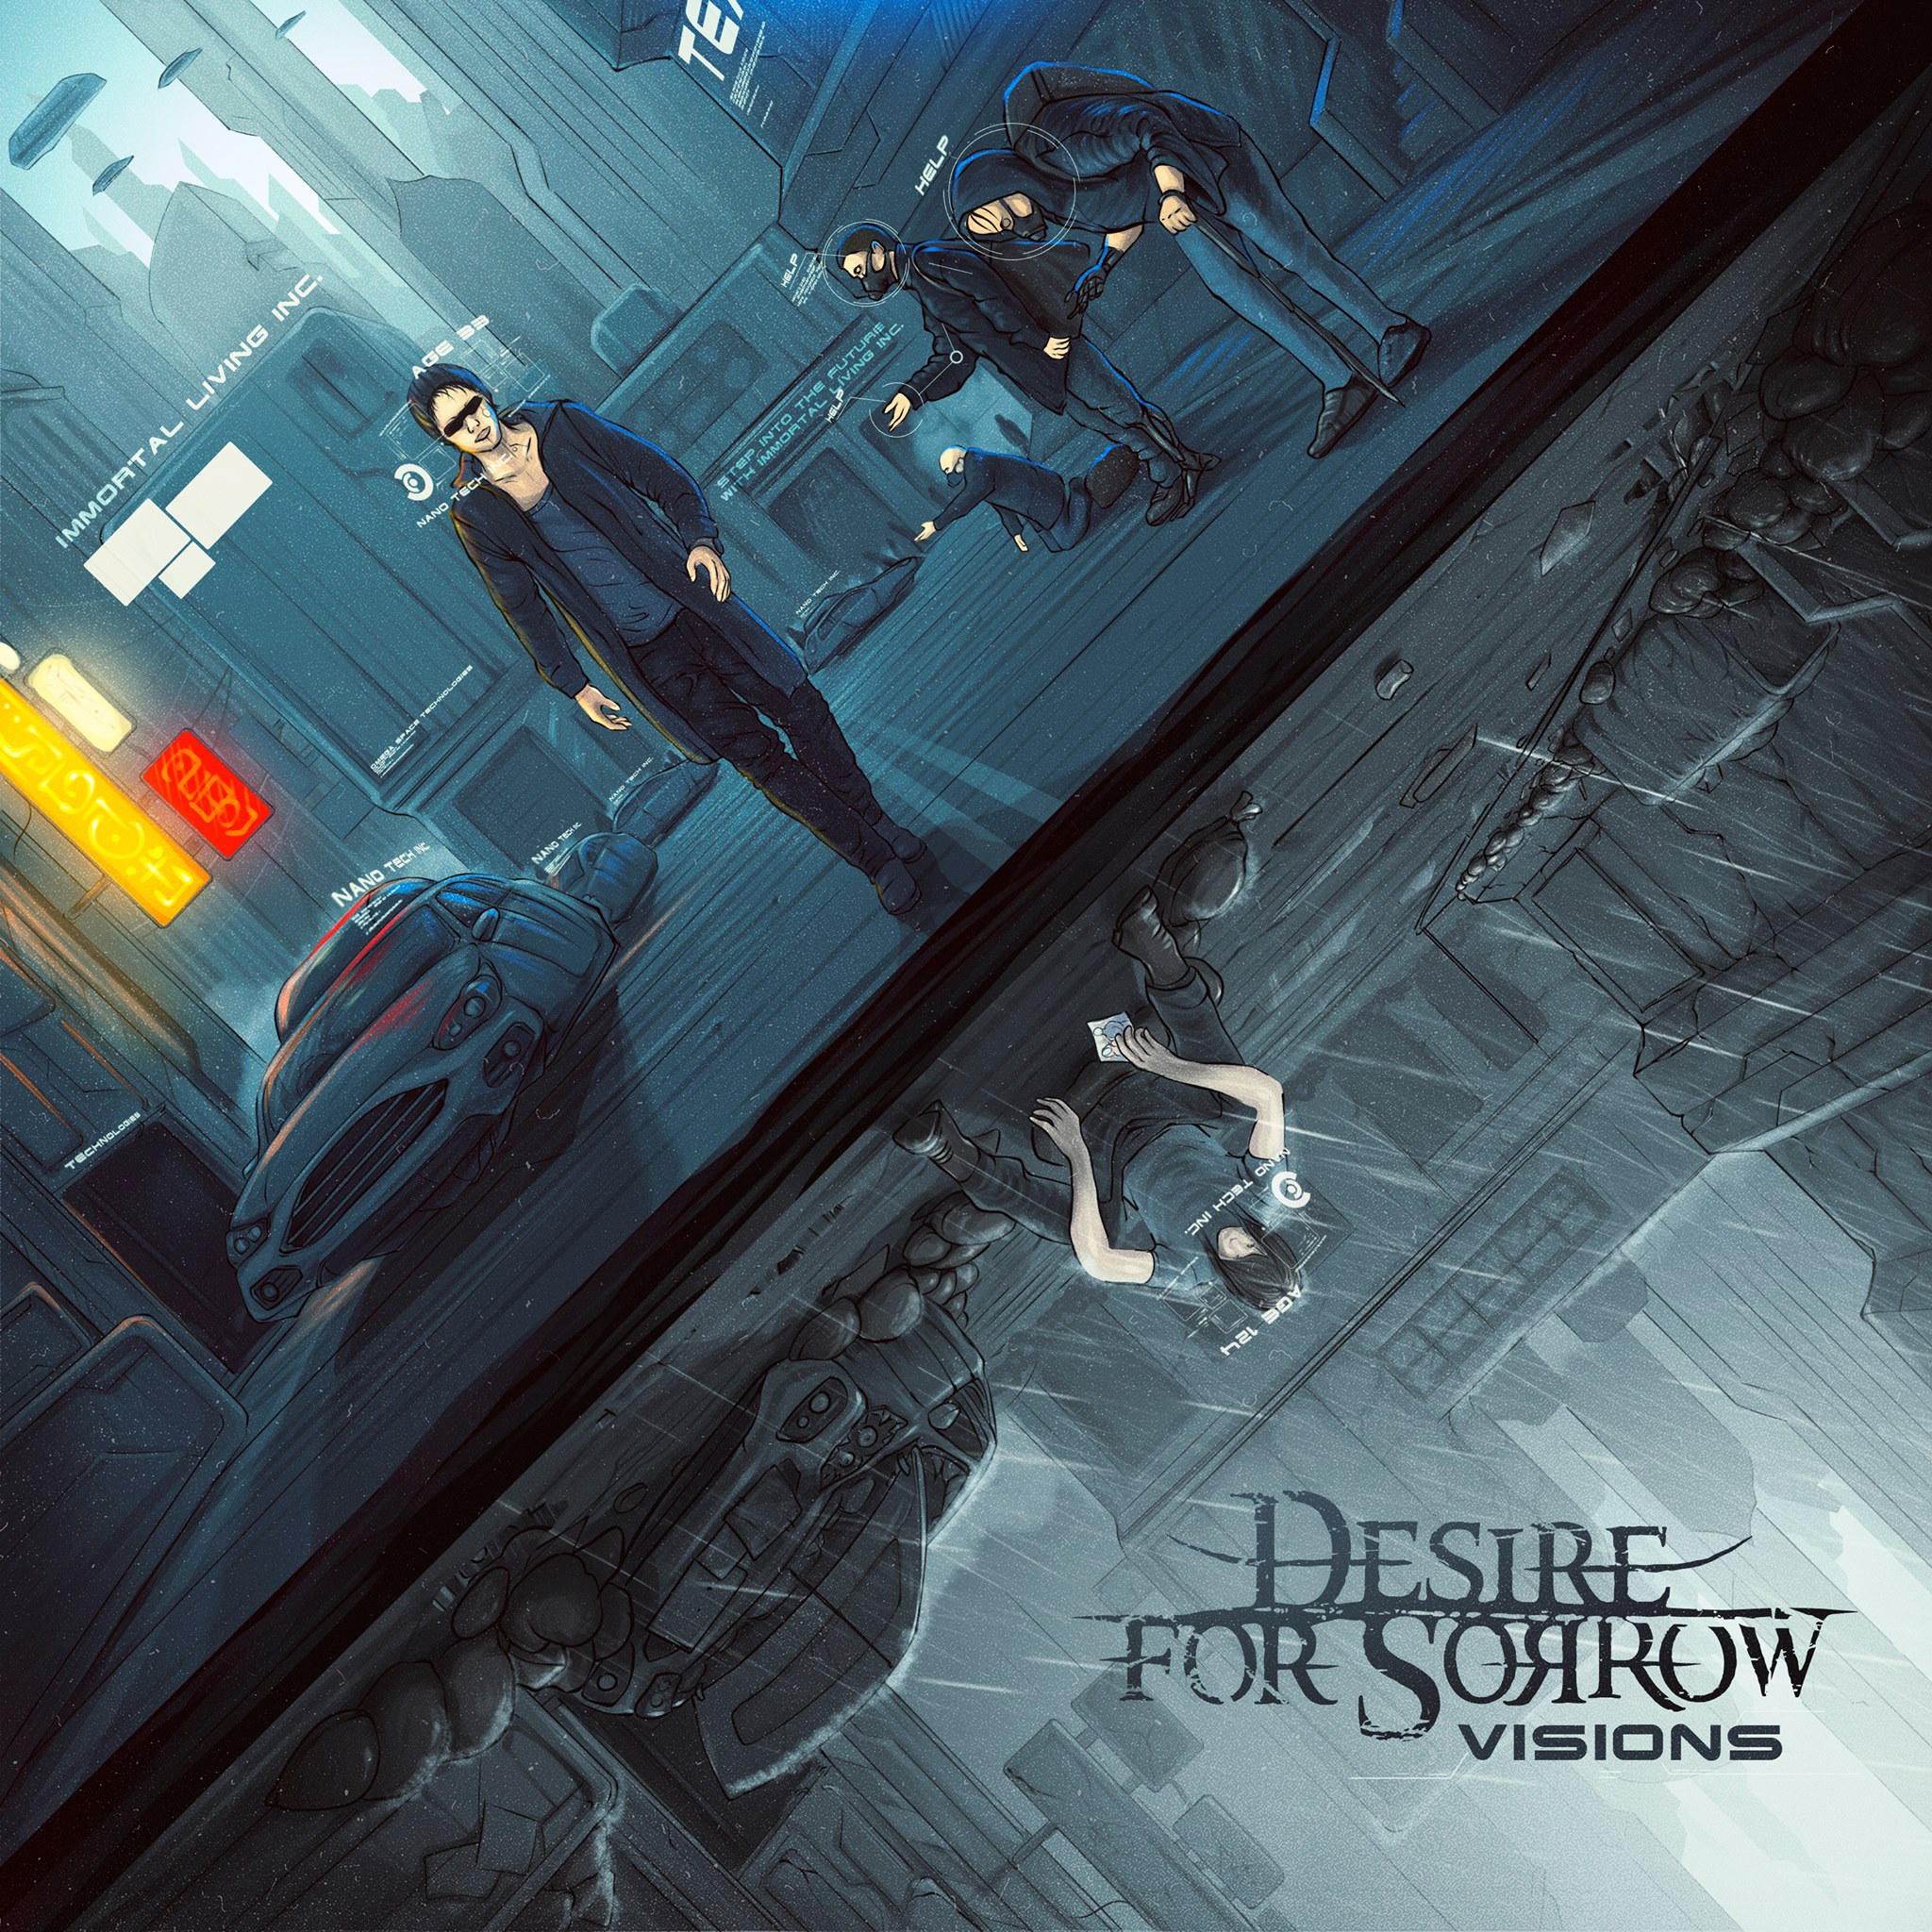 Obscuro.cz uvede exkluzivní premiéru nového klipu od Desire for Sorrow!